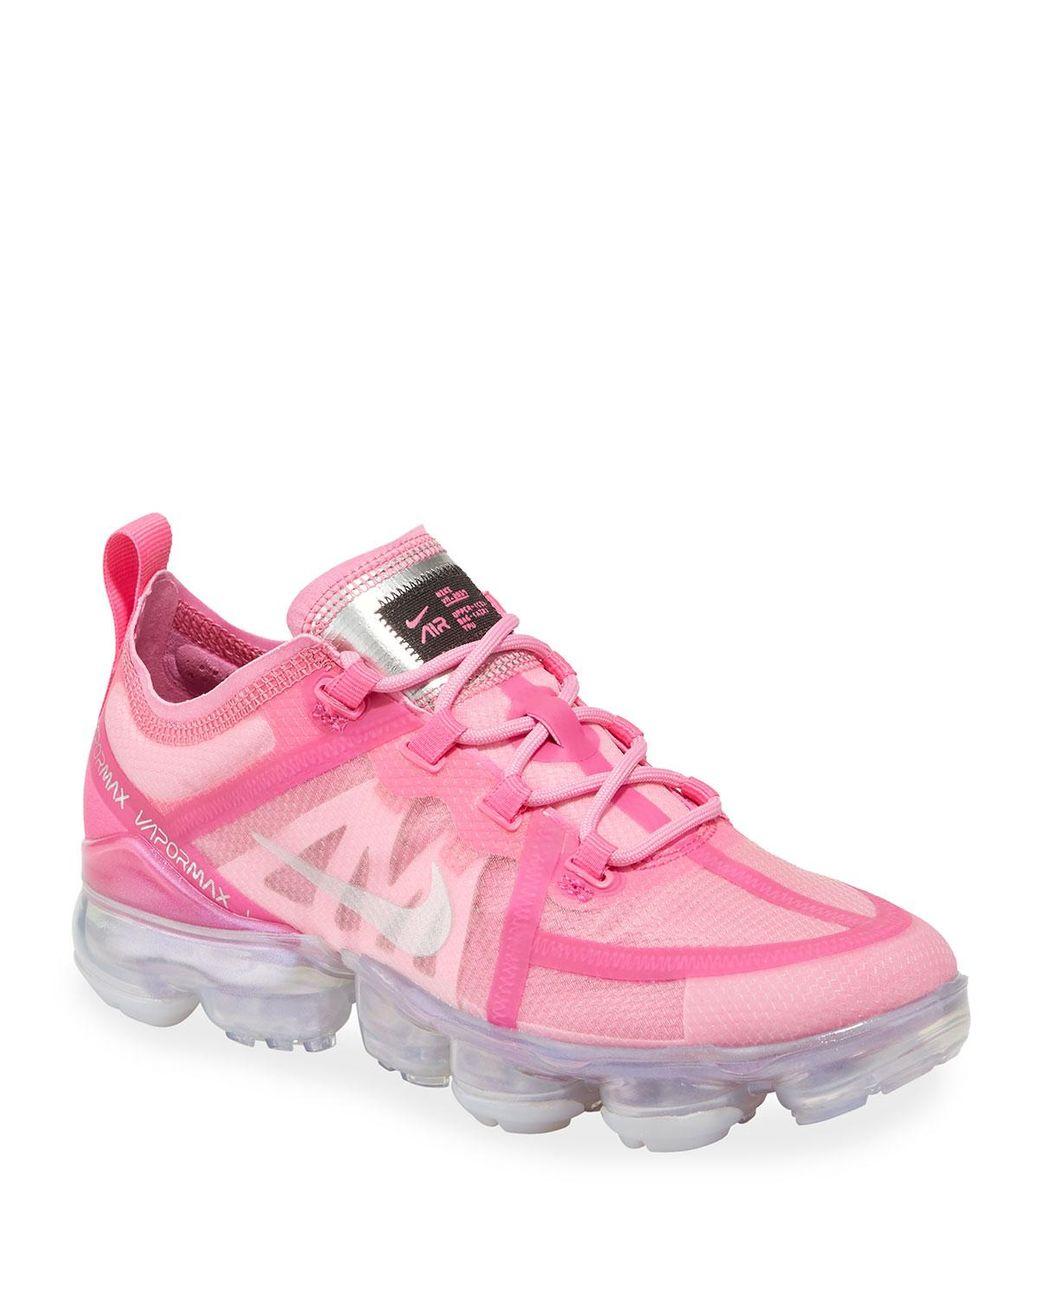 meet 13c8d 769b8 Men's Pink Vapormax 2019 Grey/navy/purp